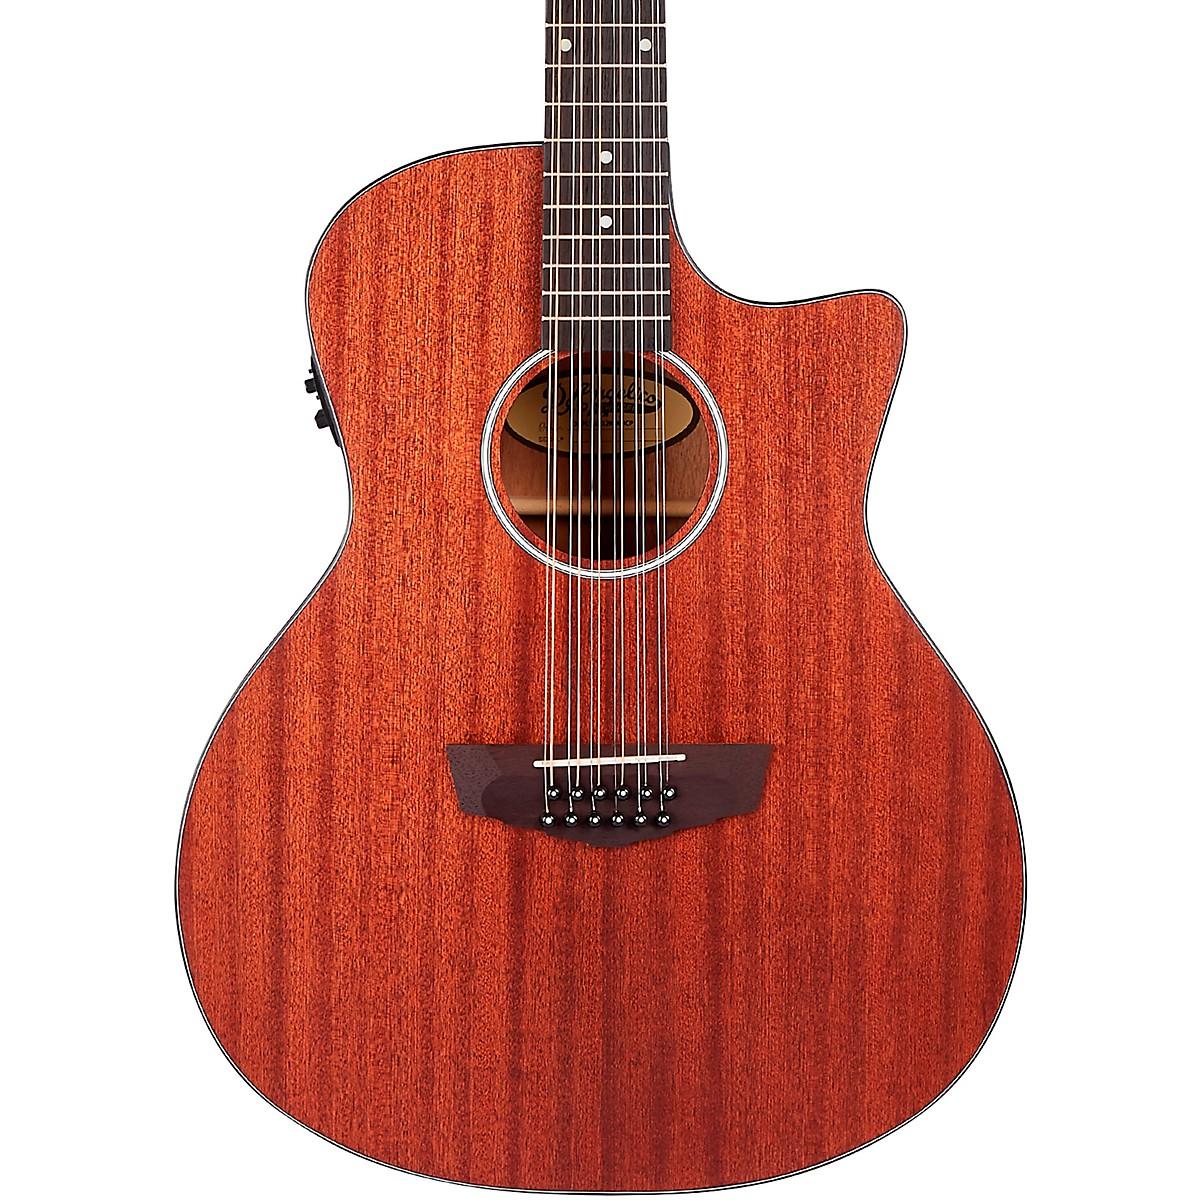 D'Angelico Premier Series Fulton LS Cutaway Grand Auditorium Acoustic-Electric Guitar